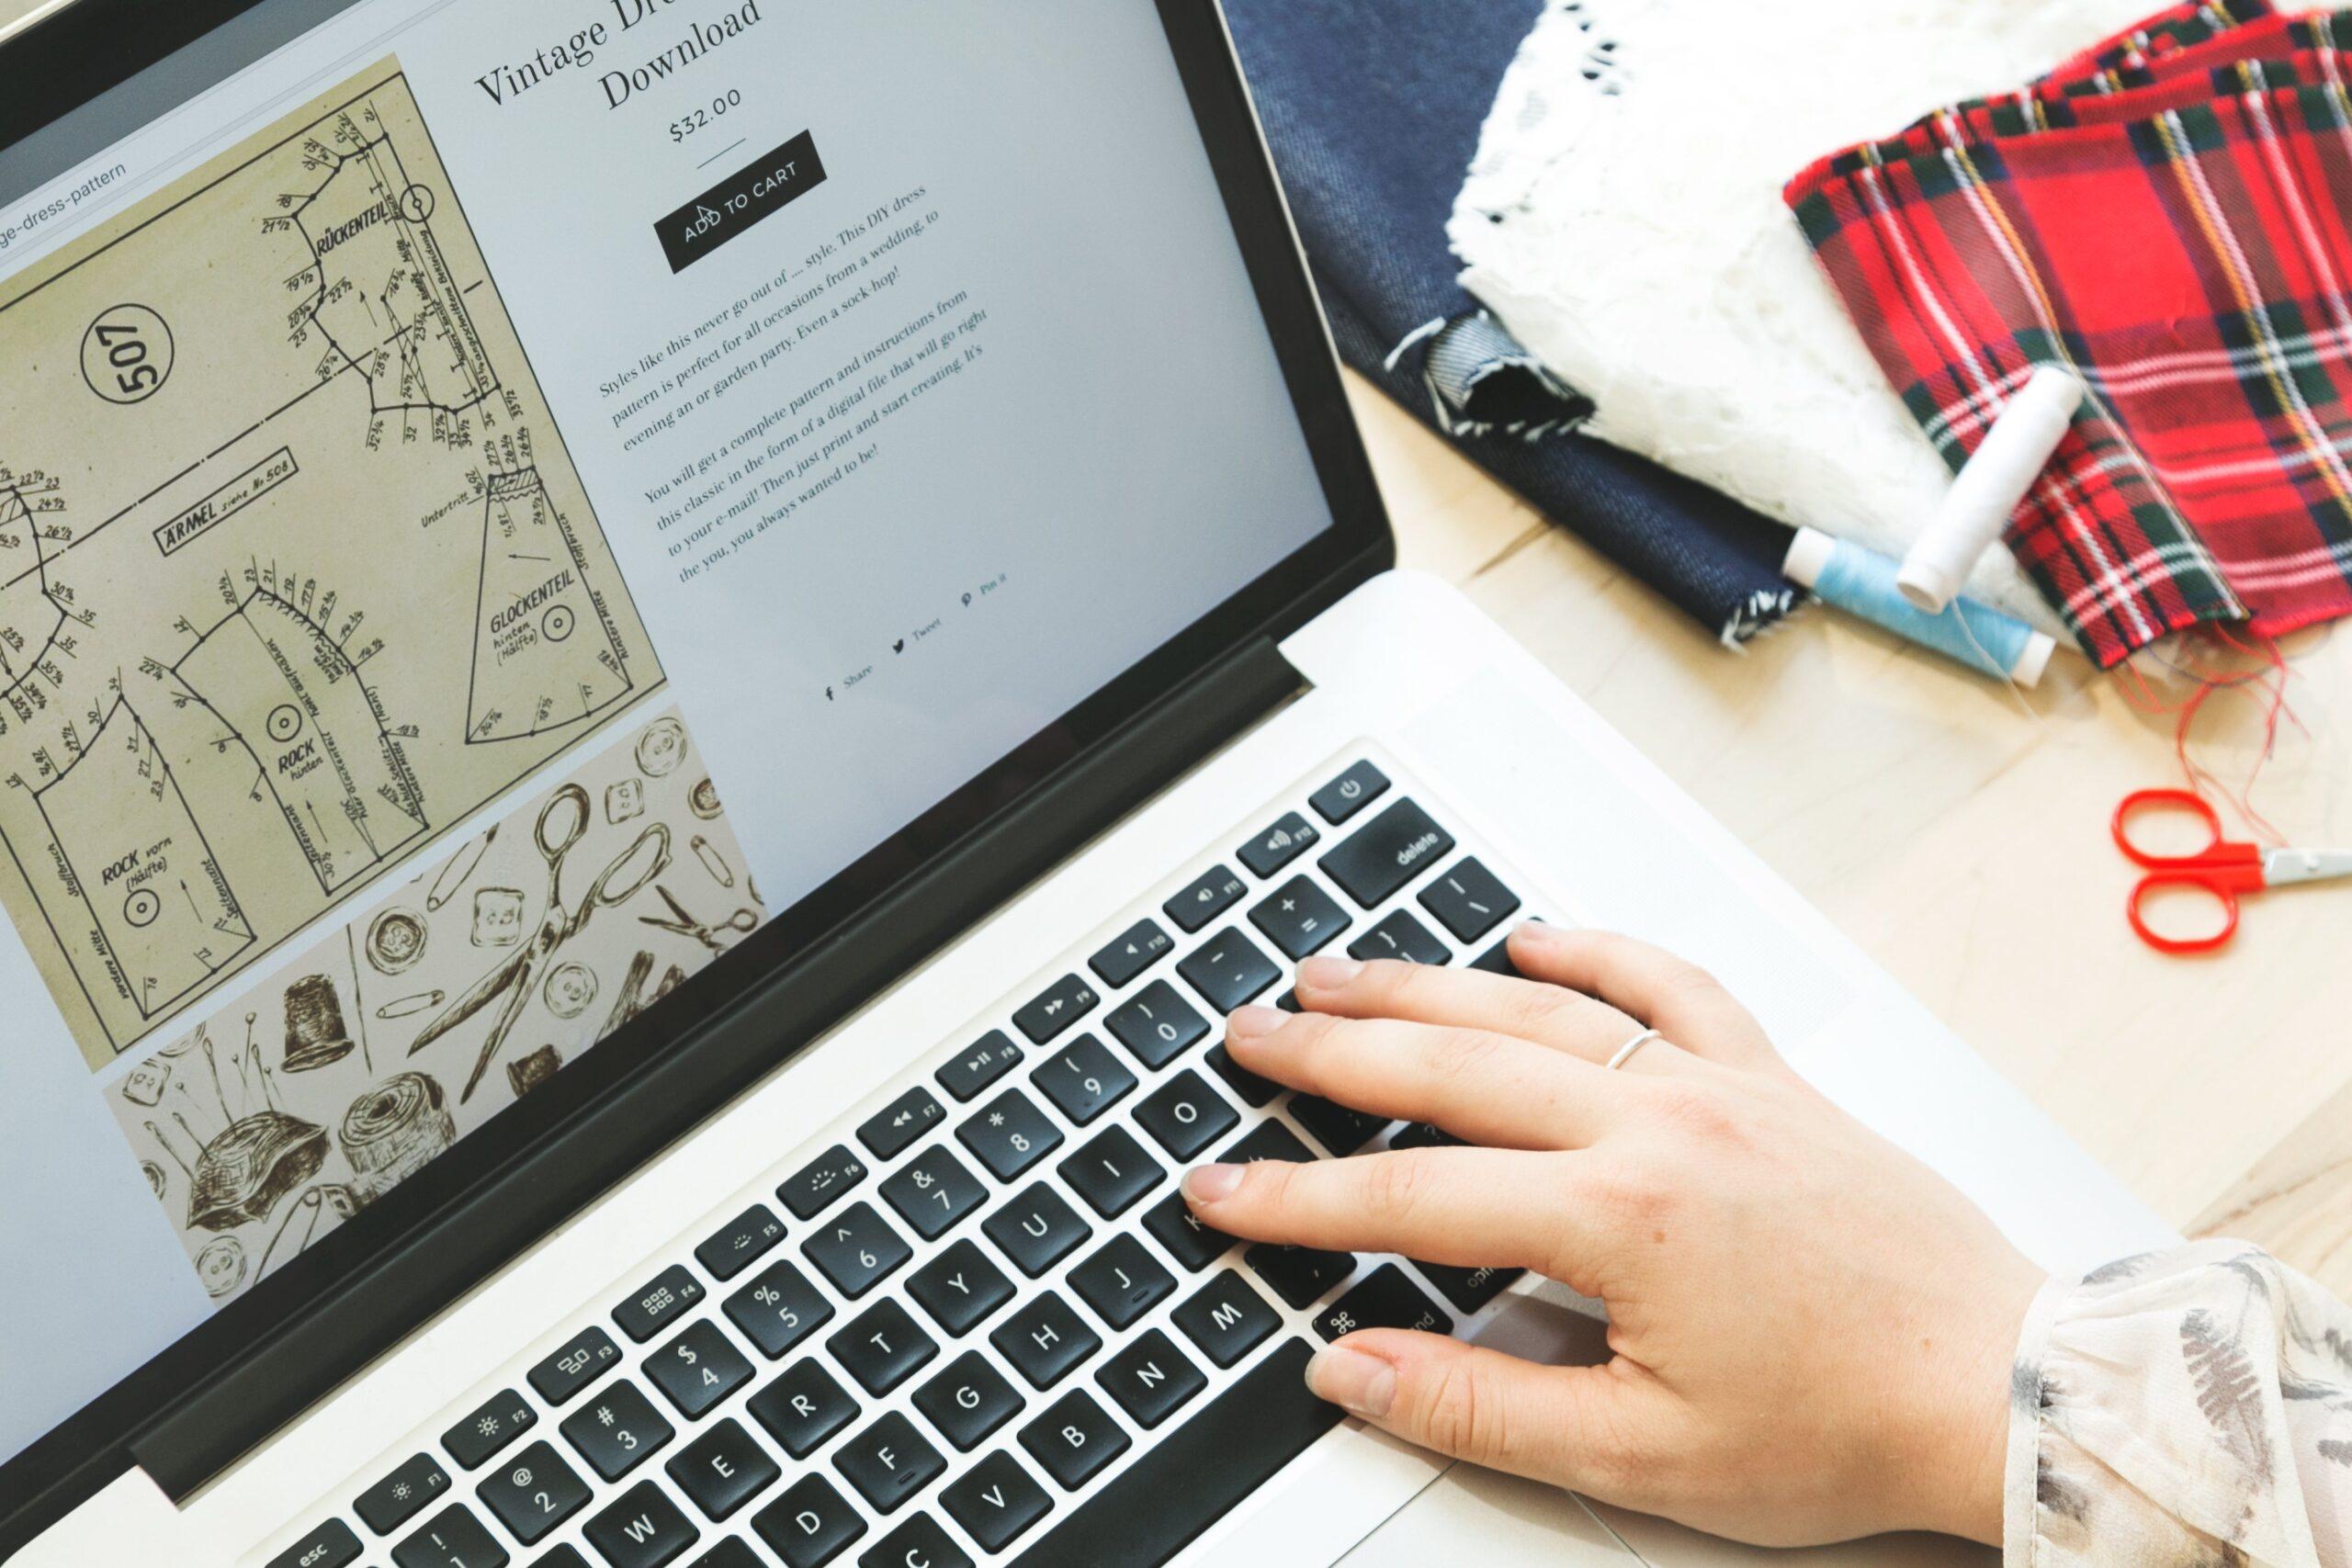 How do I create a successful small business website?